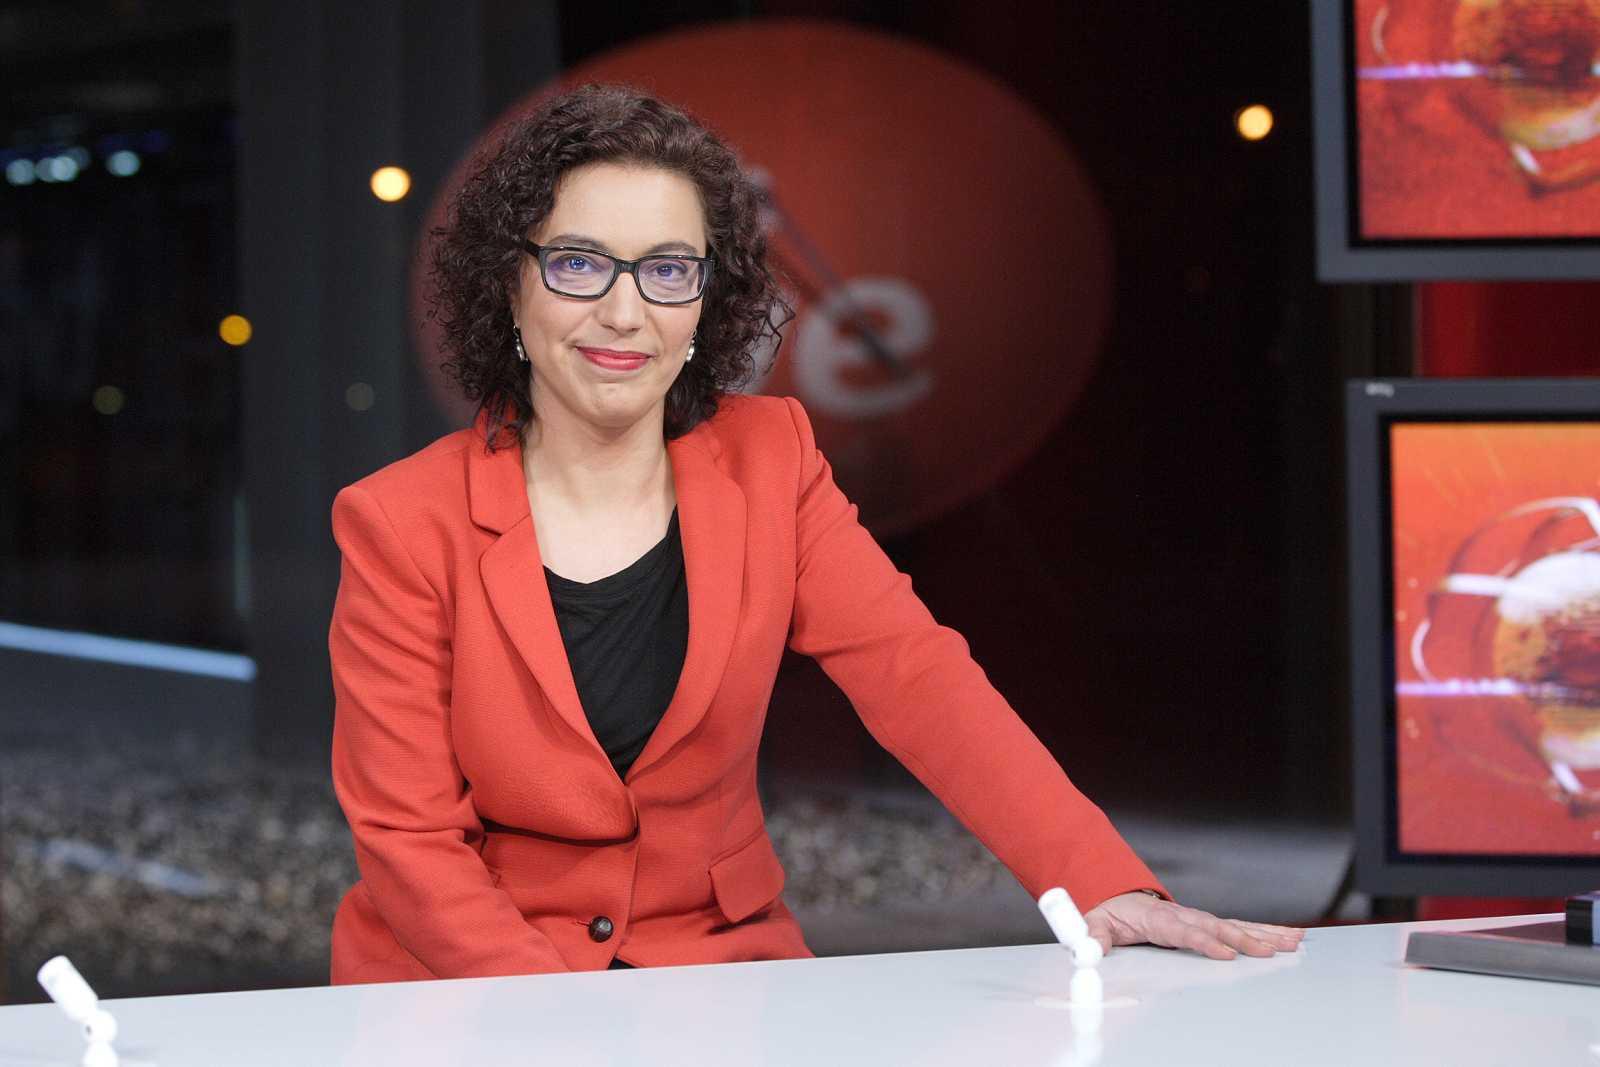 Carolina Pecharromán